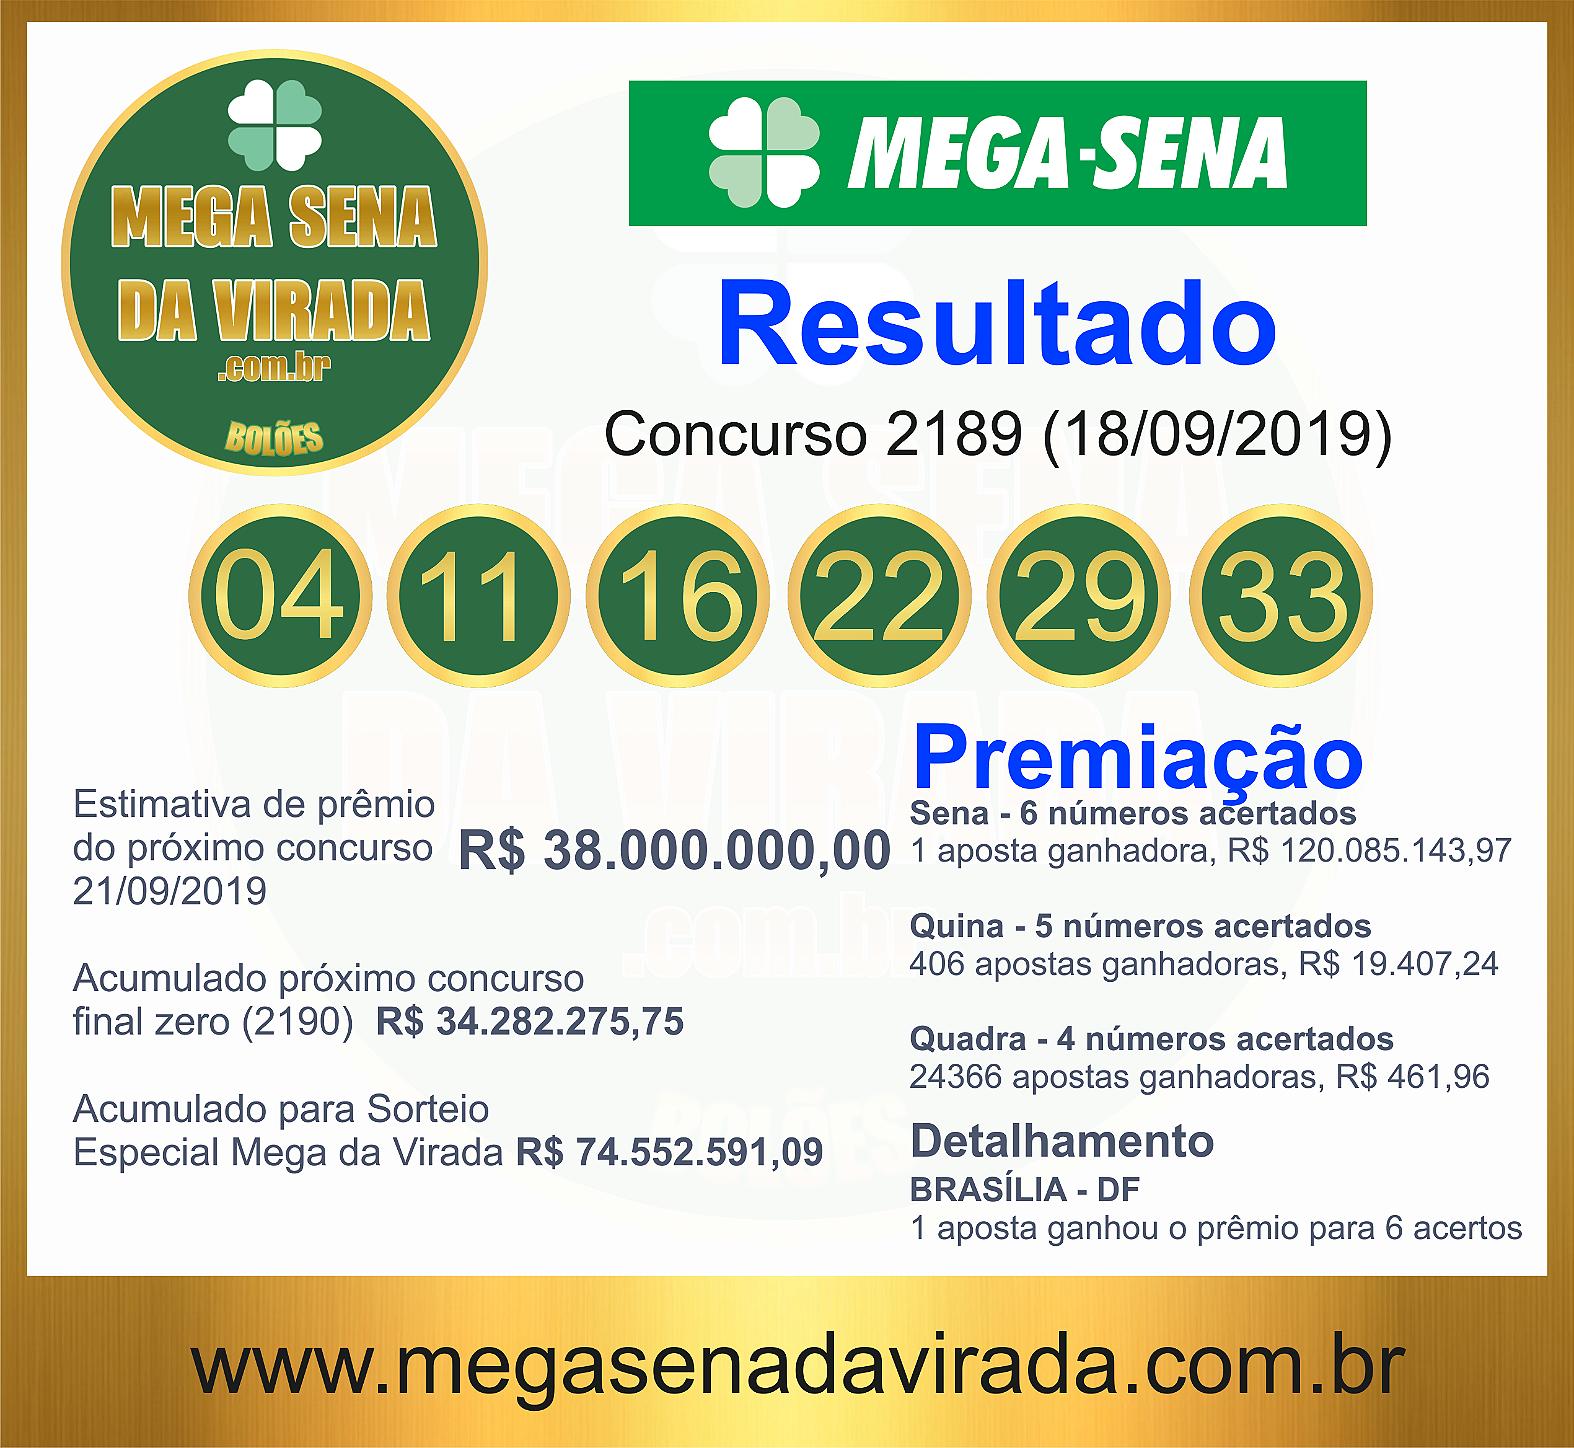 Mega Sena Concurso 2189 18/09/2019